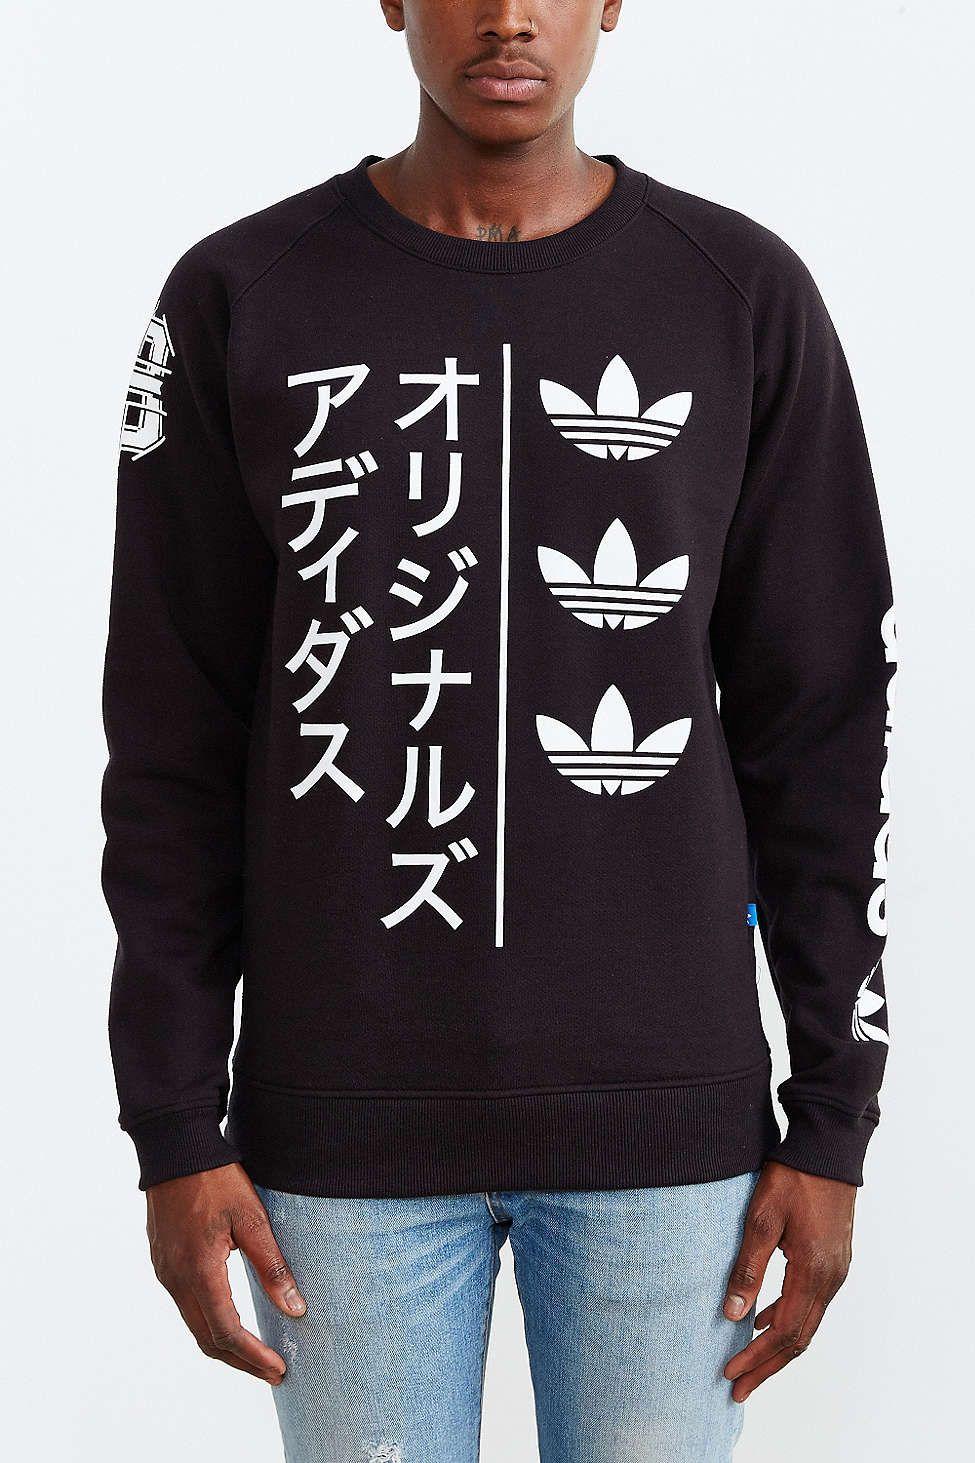 Nike jacket chinese - Adidas Originals Tokyo Stripe Long Sleeve Sweatshirt